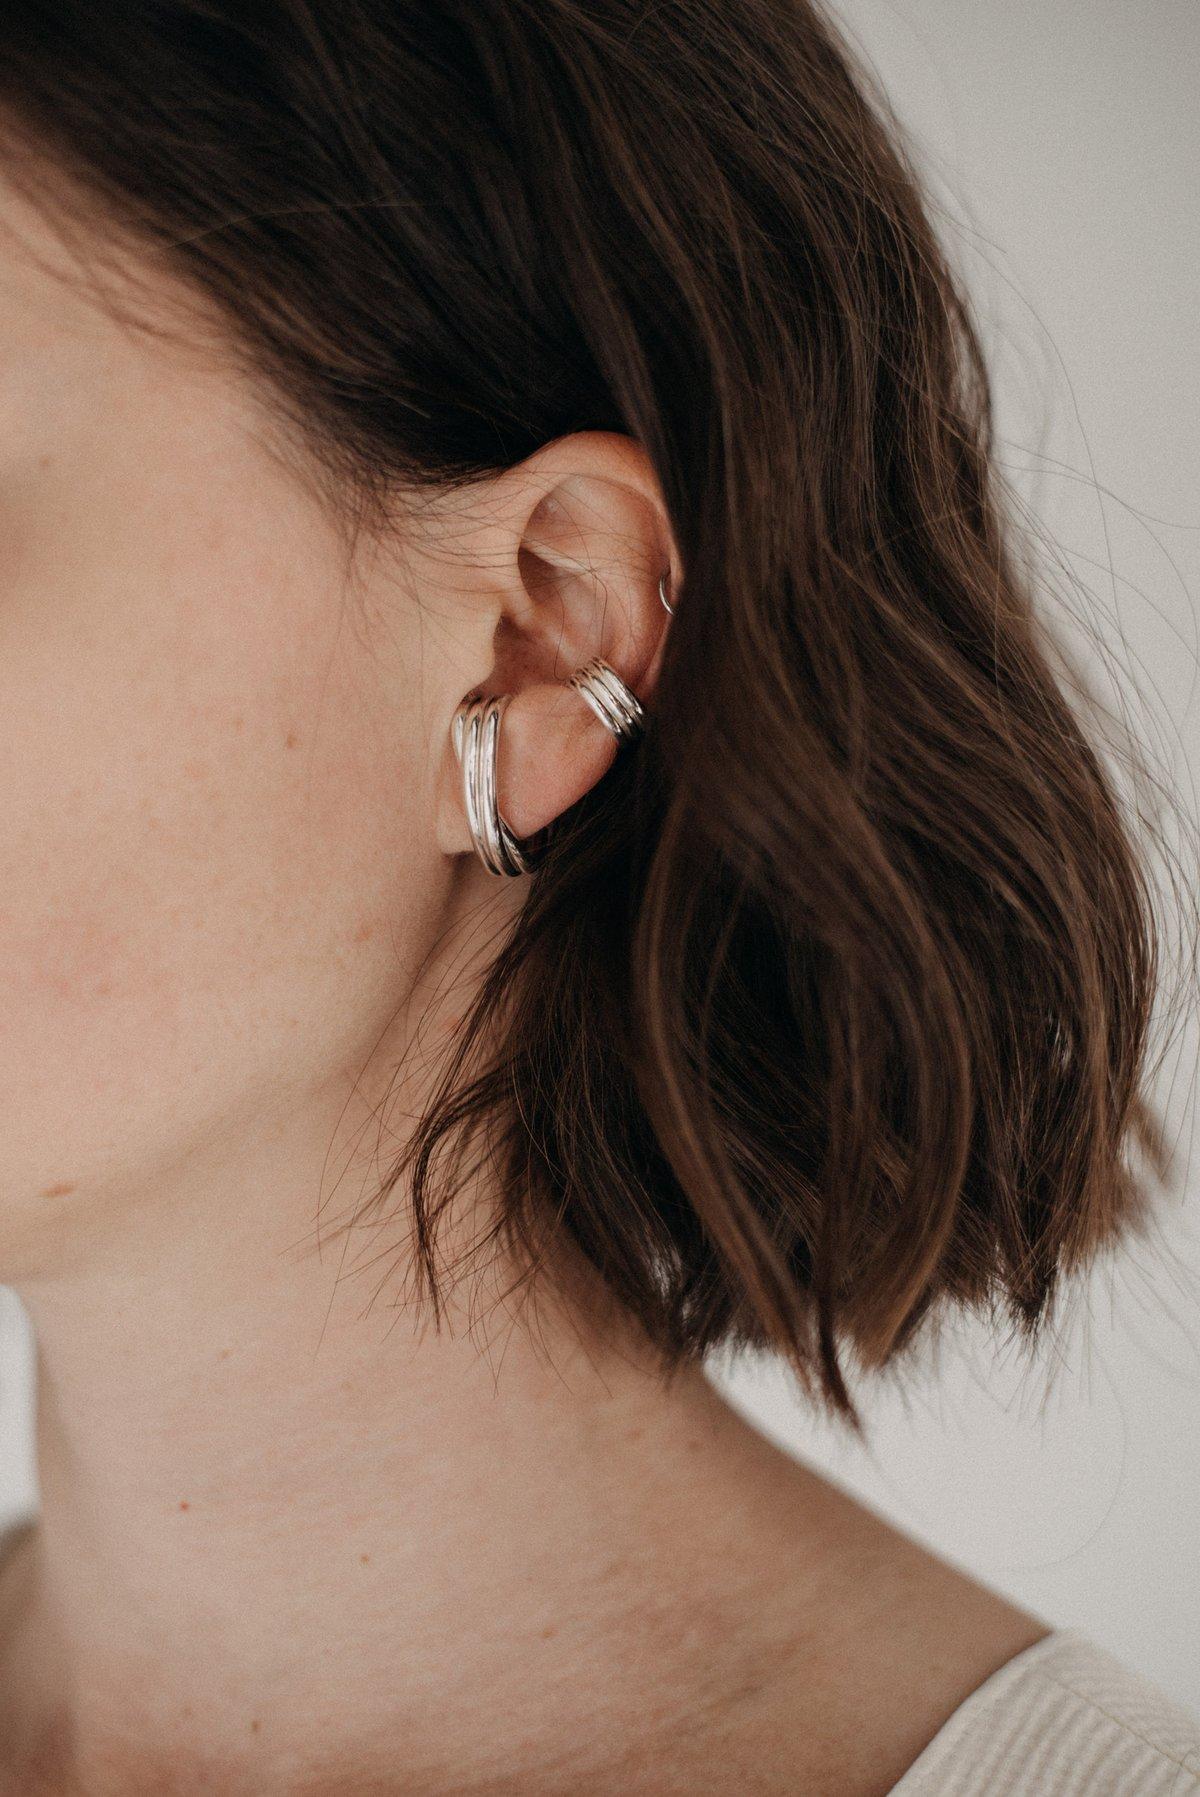 Image of silver earrings